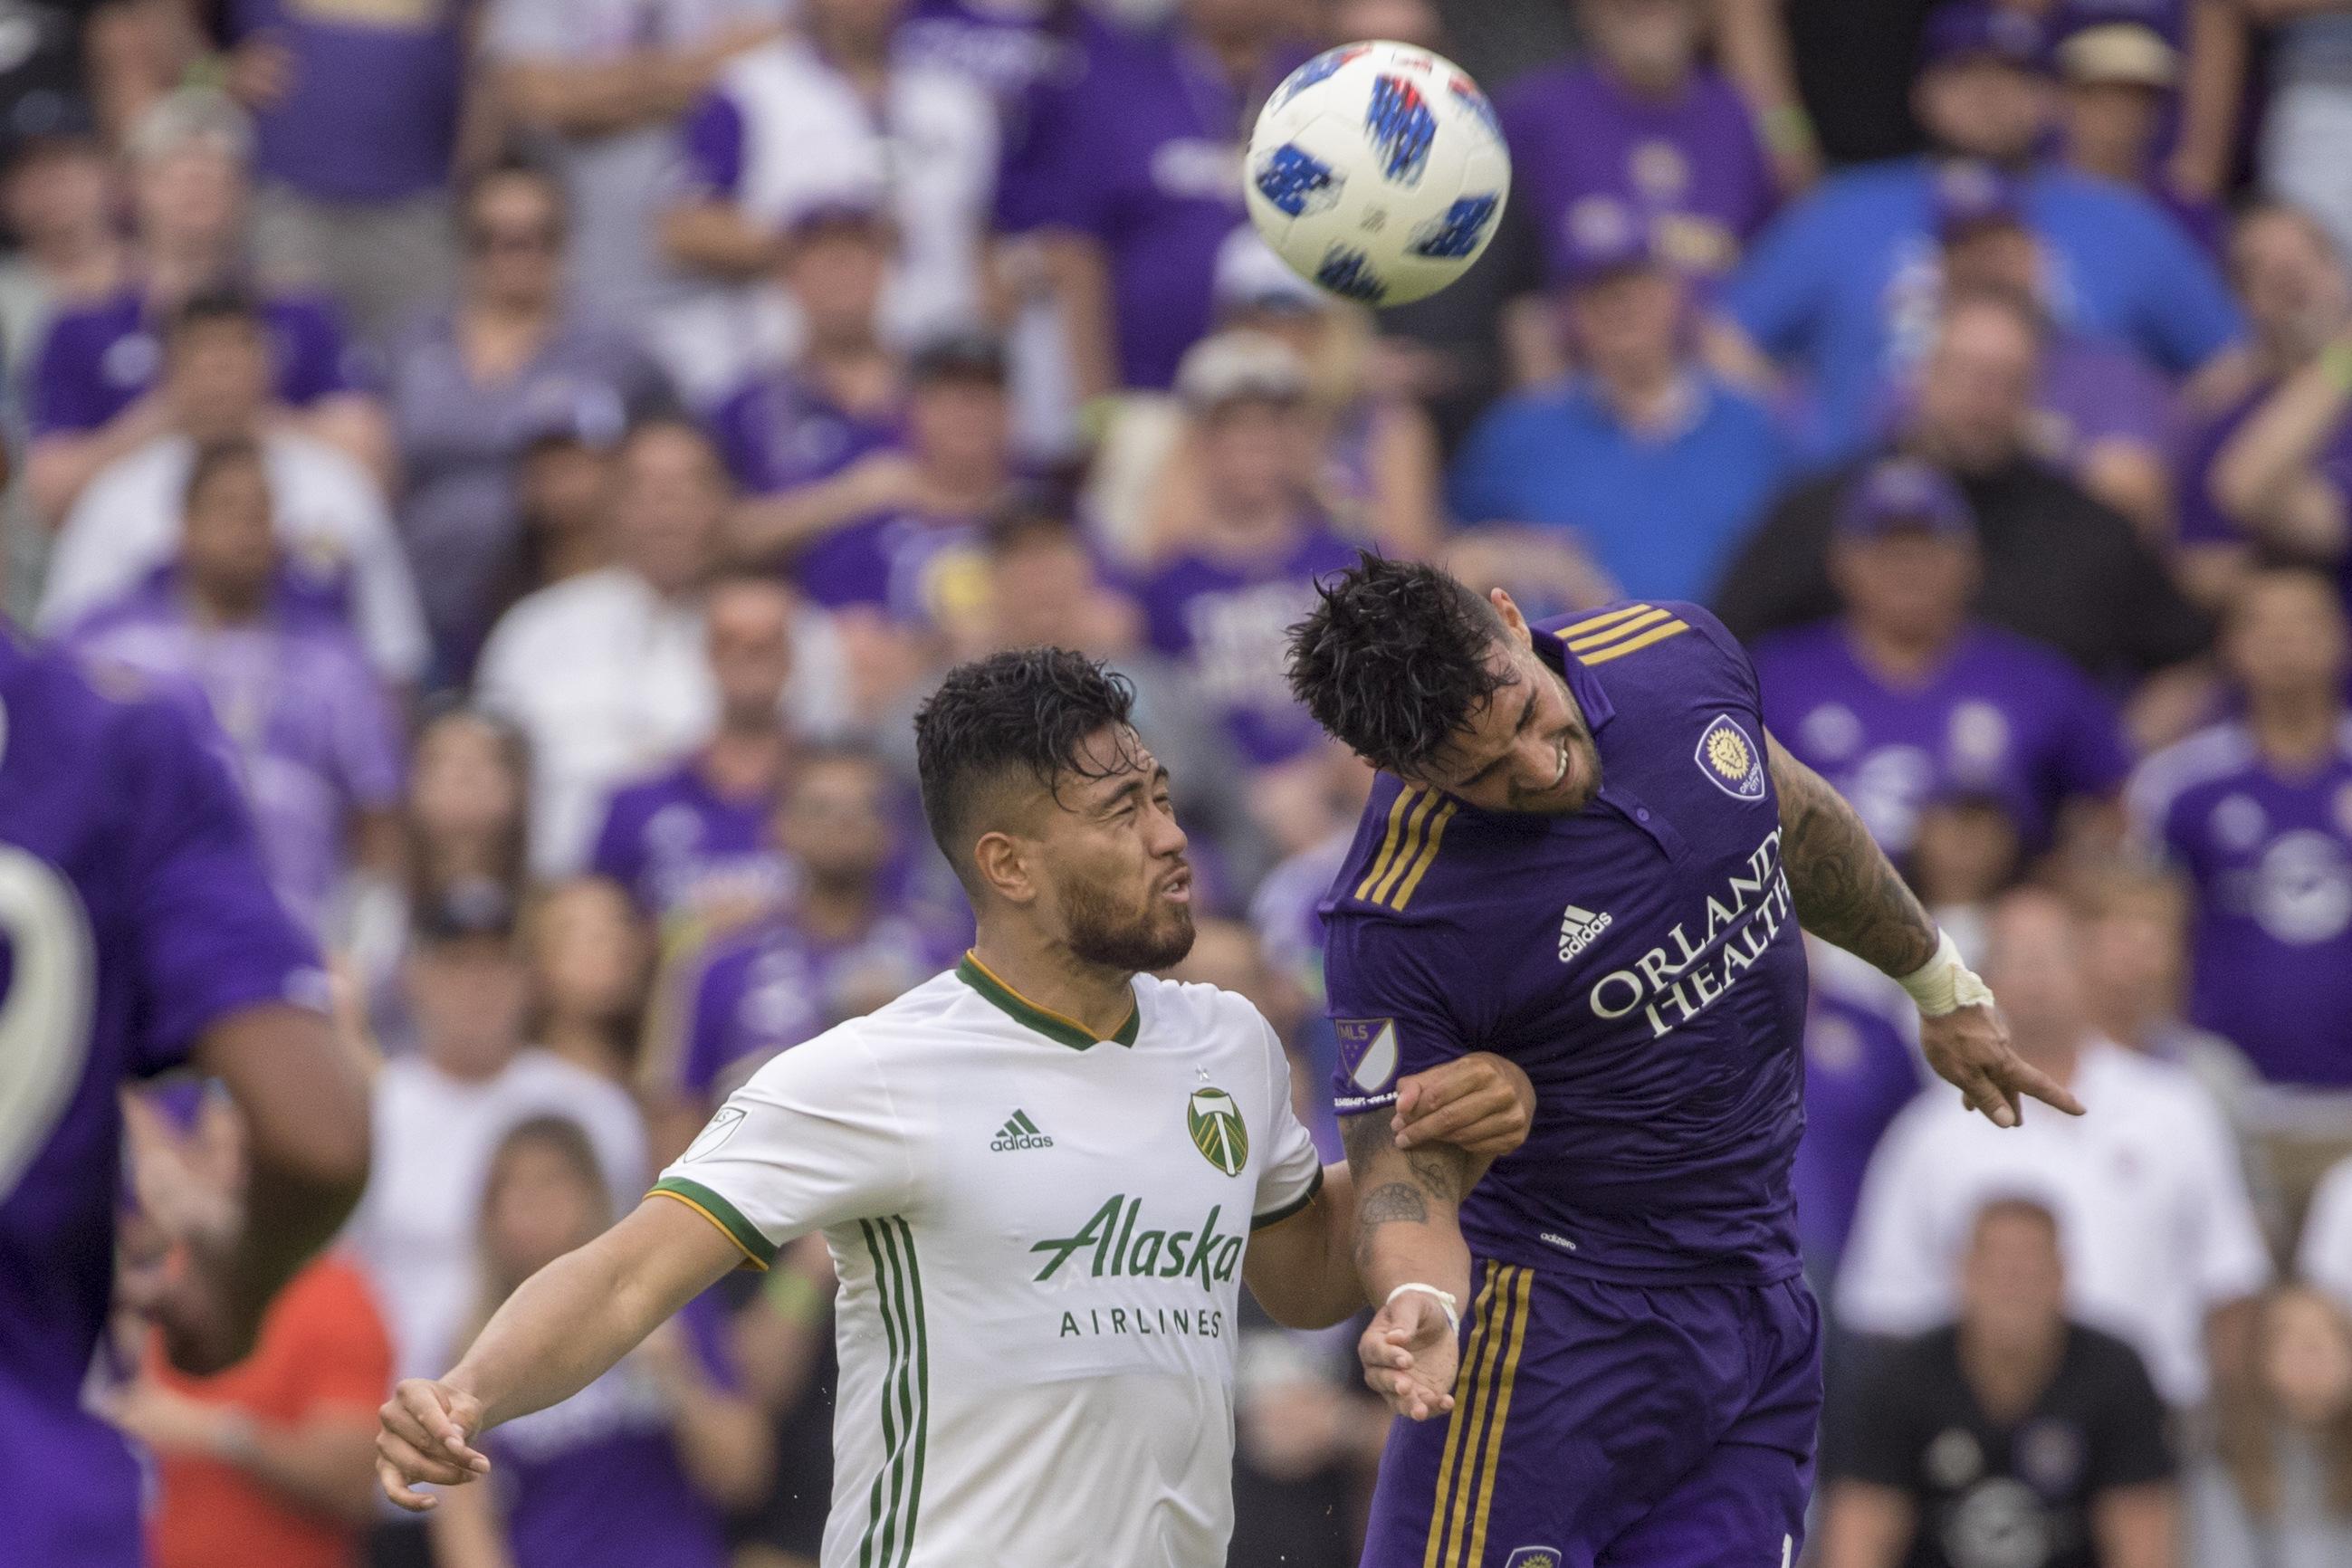 SOCCER: APR 08 MLS - Portland Timbers at Orlando City SC